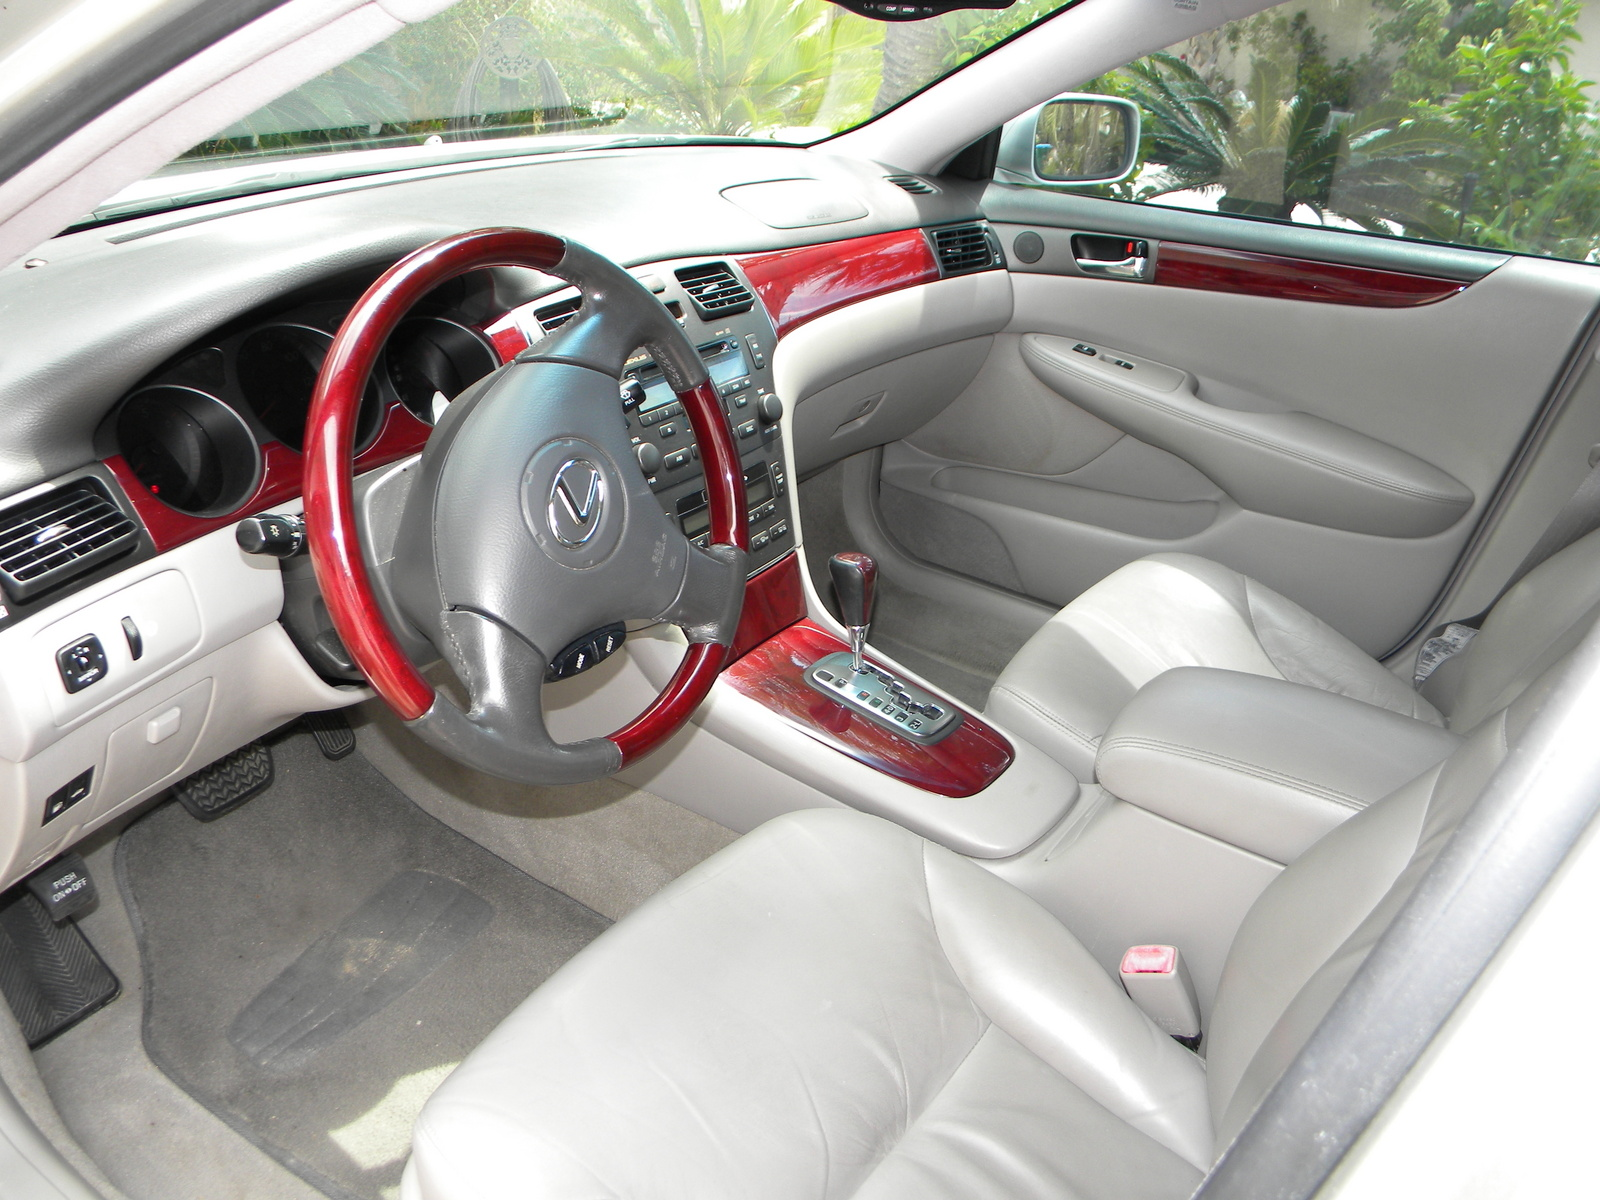 2004 Lexus ES 330 Partsopen